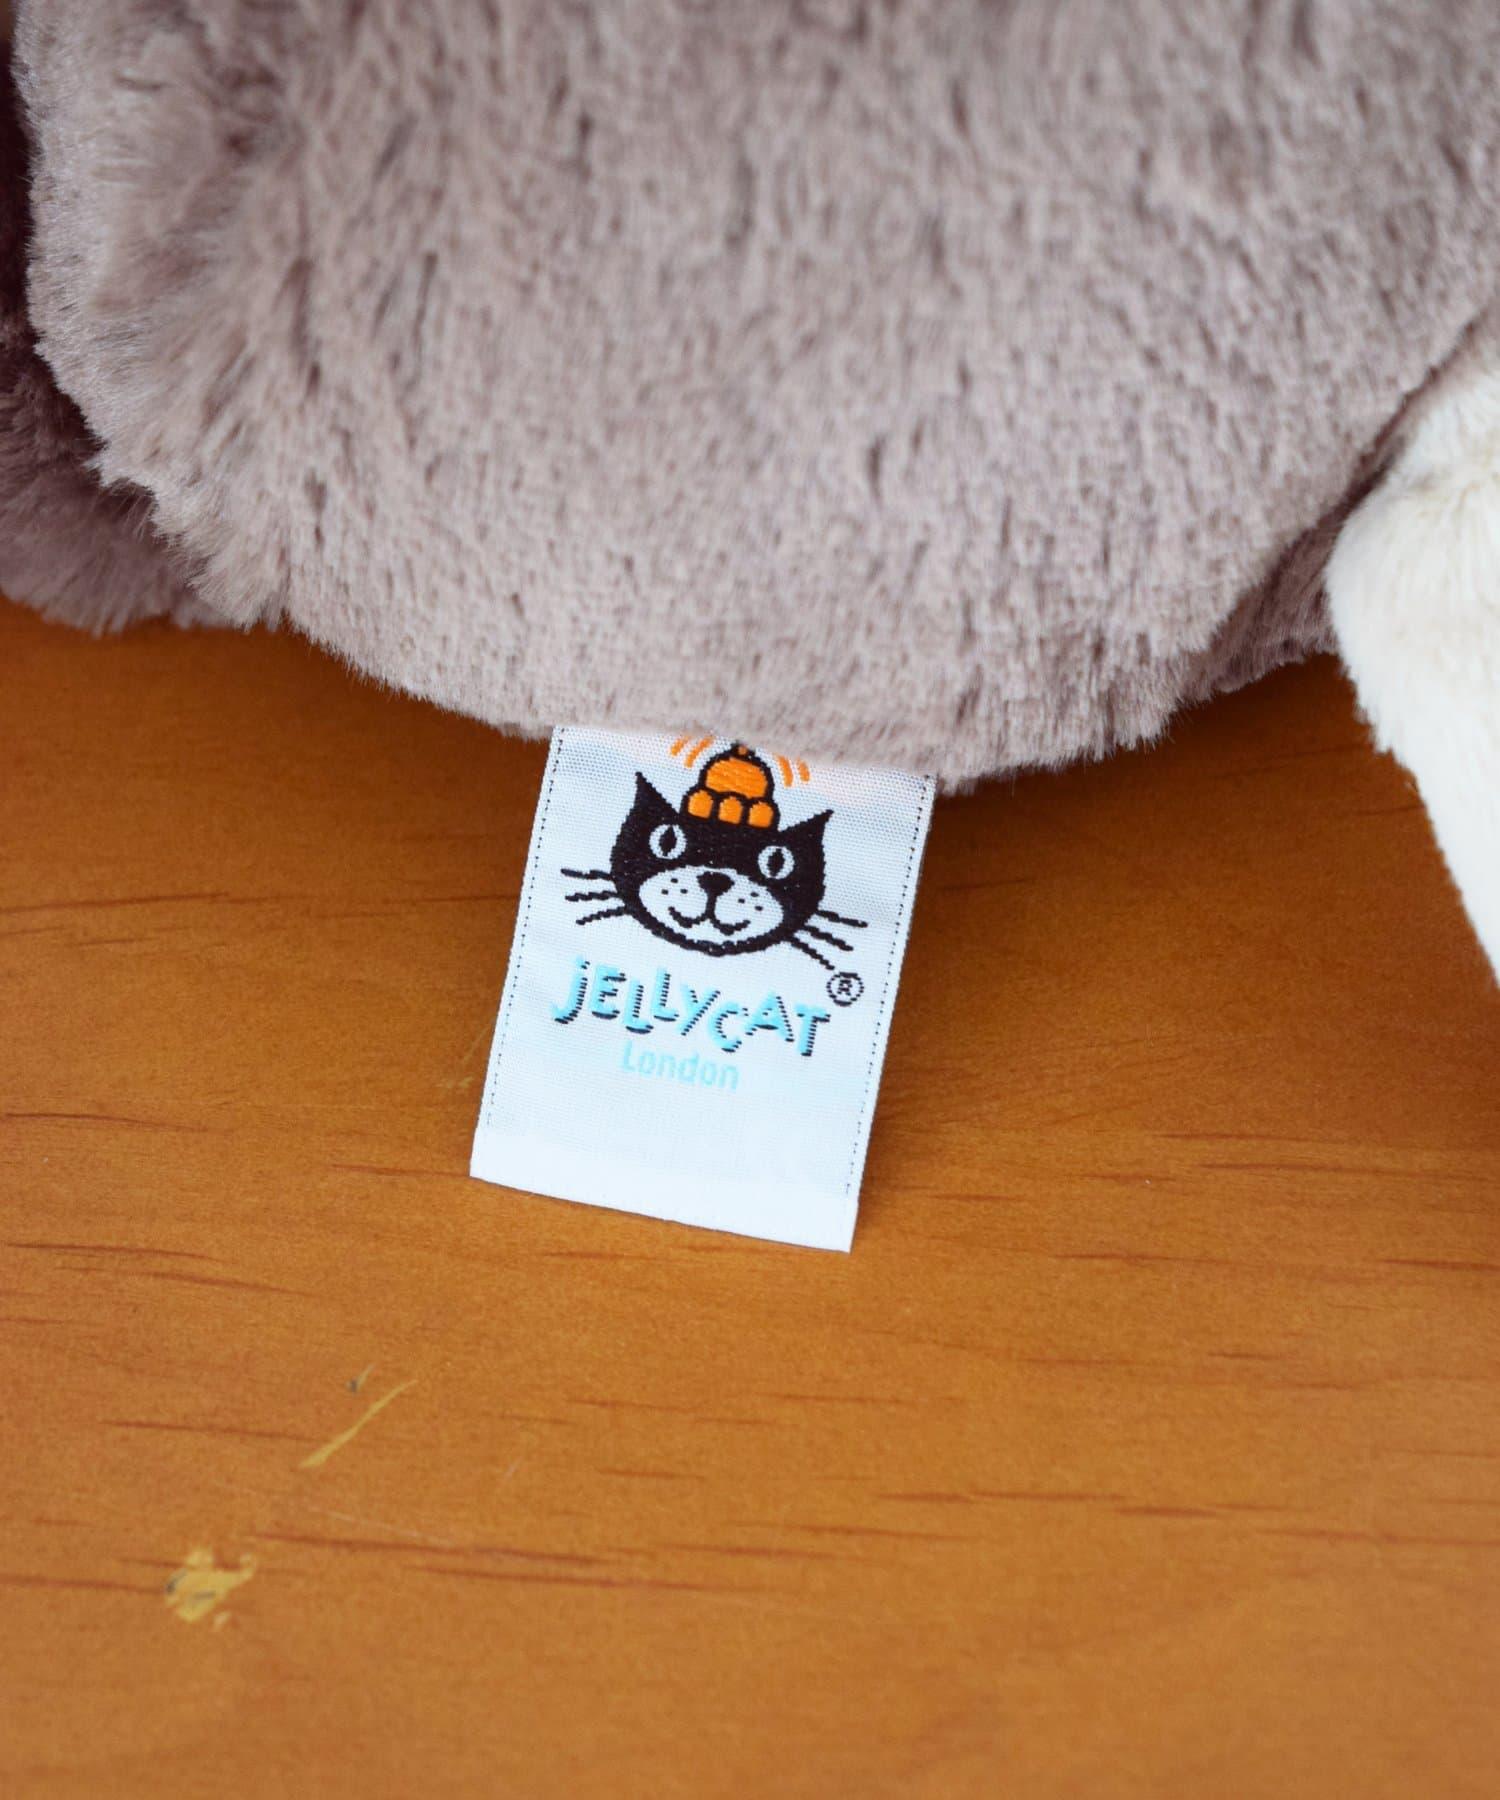 BIRTHDAY BAR(バースデイバー) 【JELLY CAT】 Bashful Monkey Large